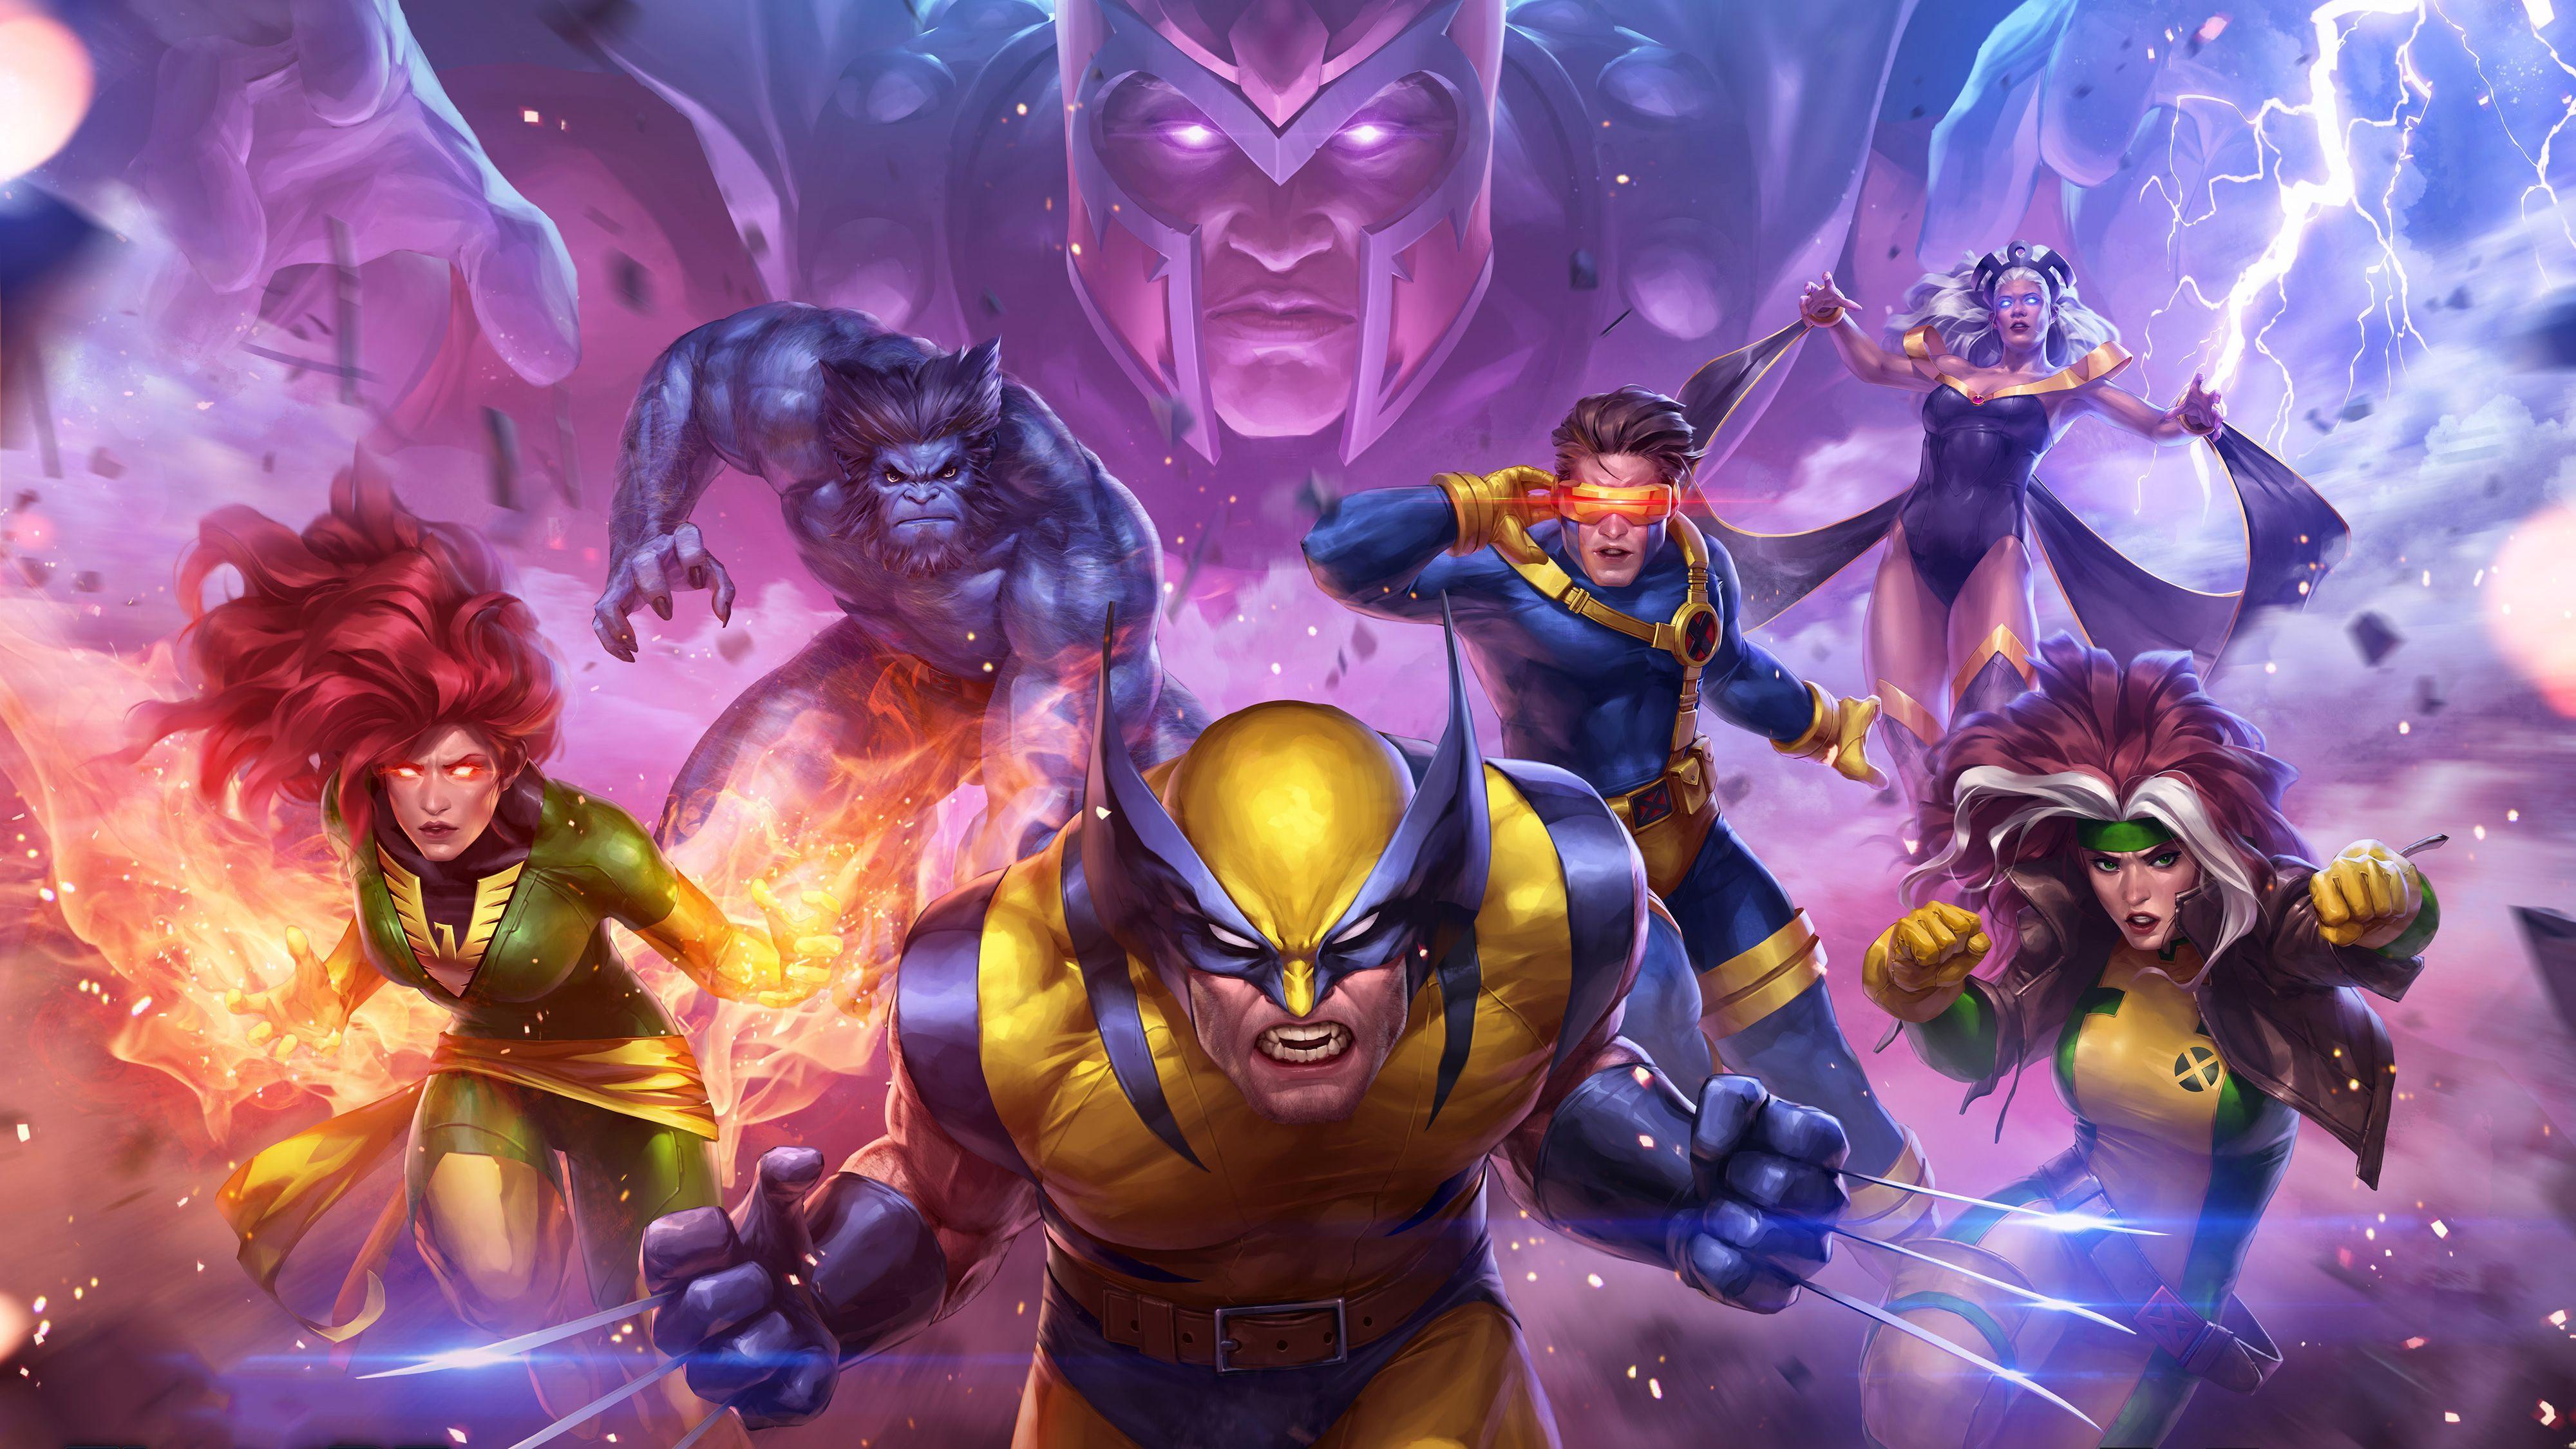 Marvel X Men Wallpapers Top Free Marvel X Men Backgrounds Wallpaperaccess